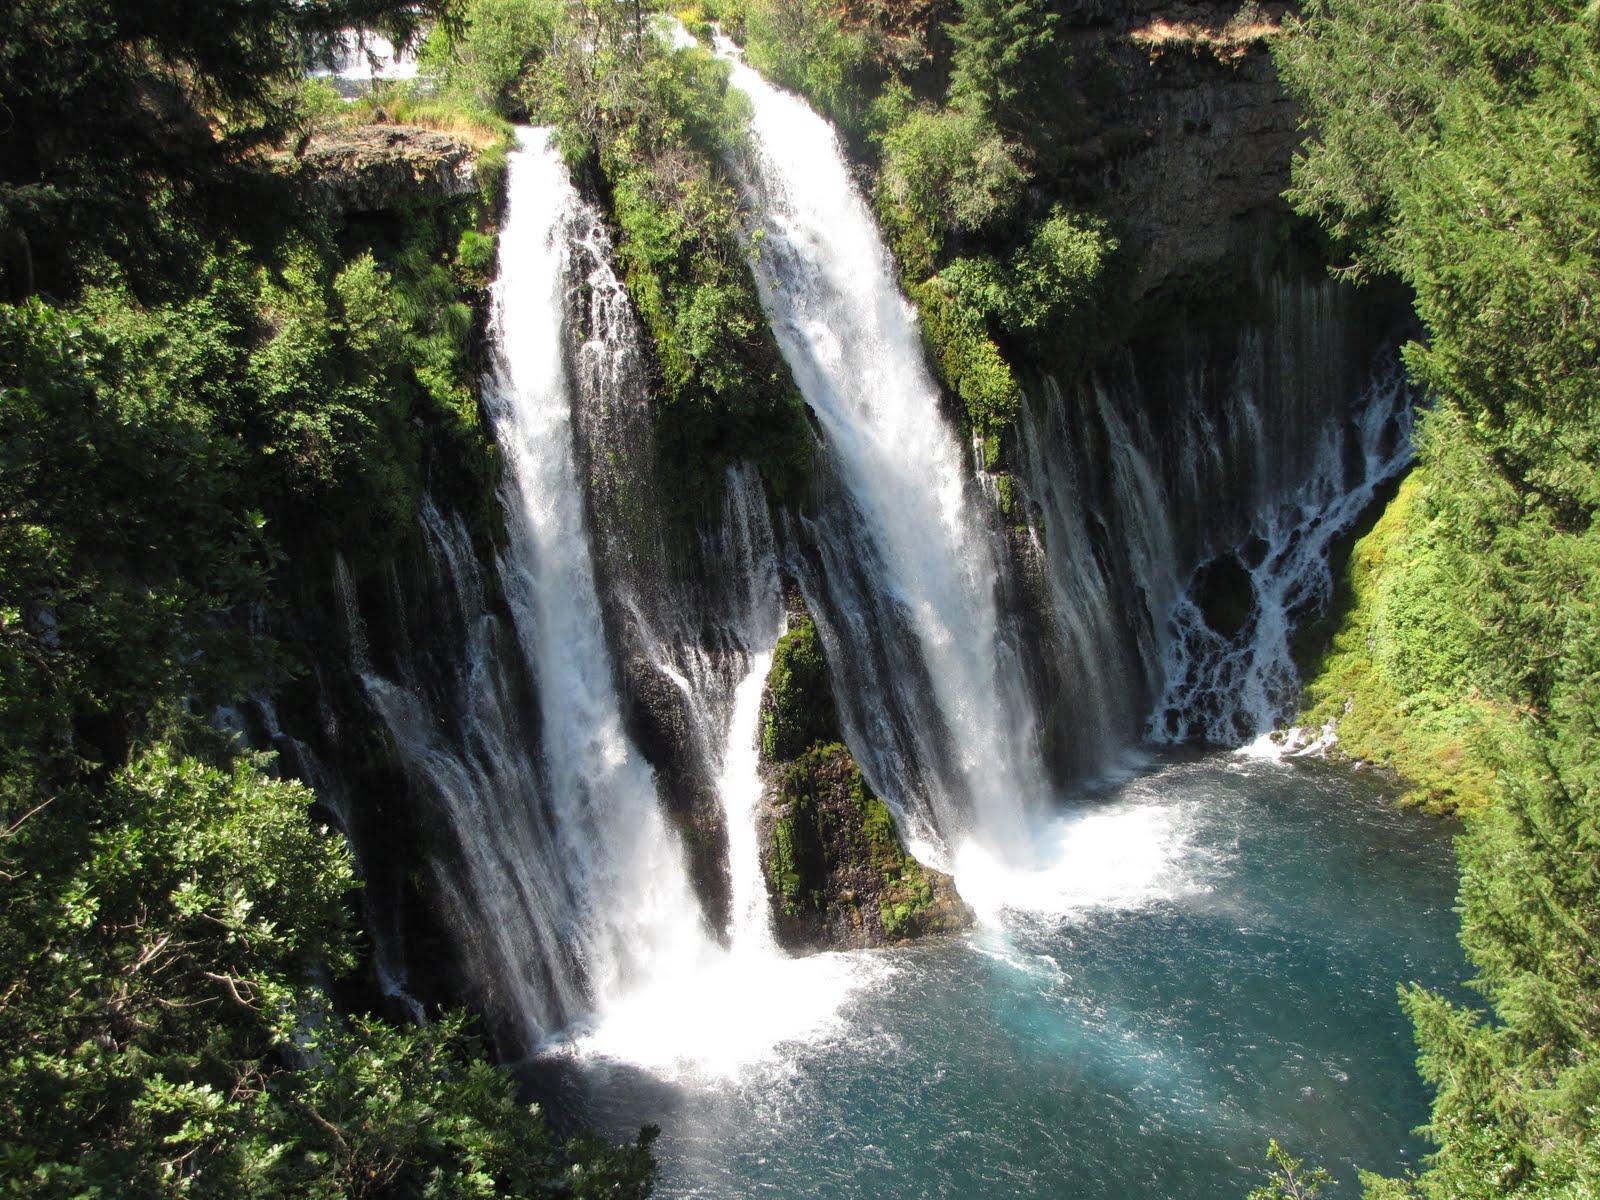 Kat S Chronicles 100722 Burney Falls Amp Mt Shasta